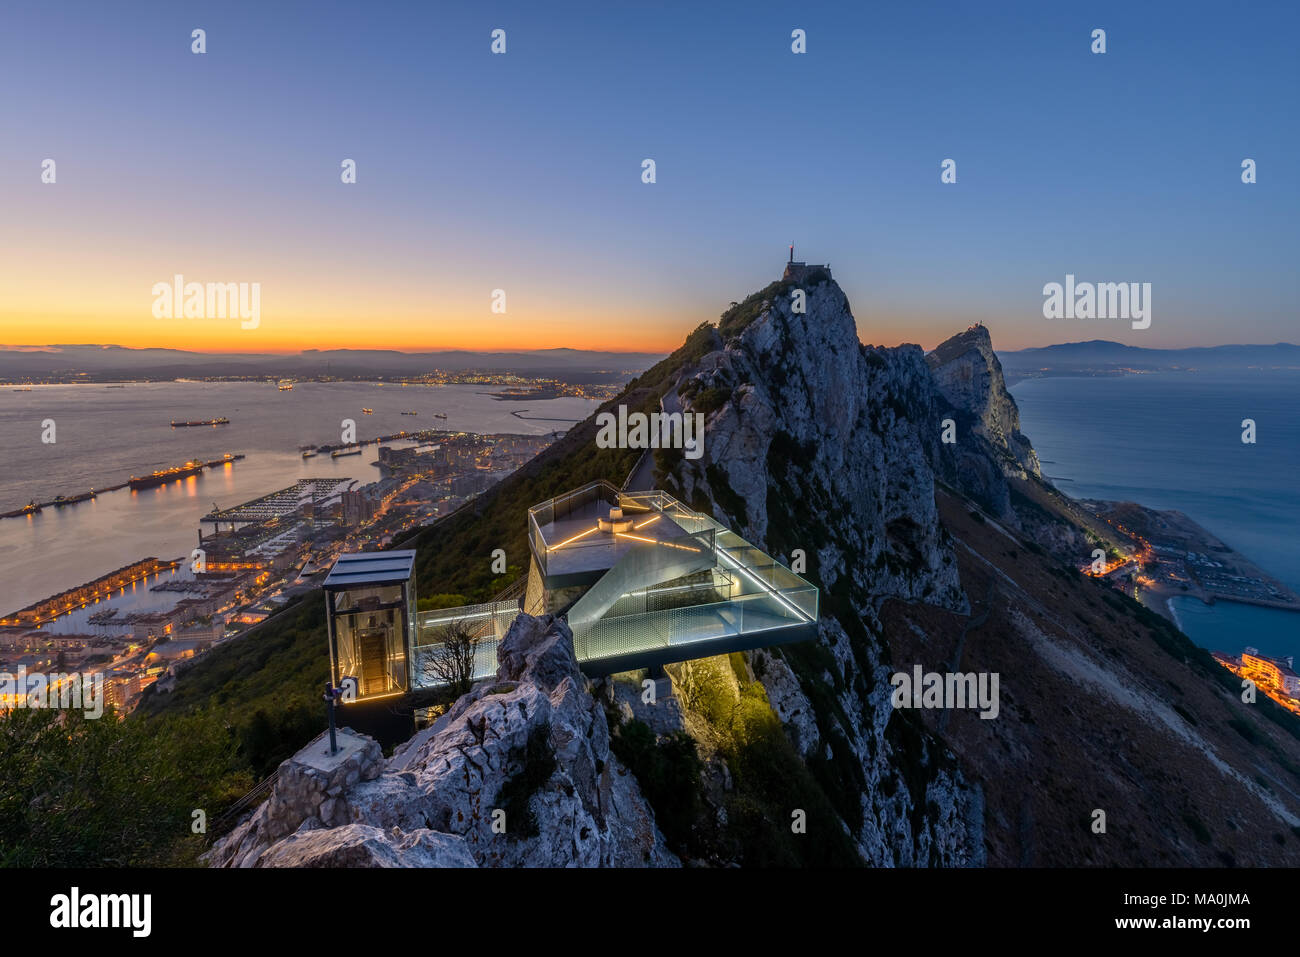 New Gibraltar Skywalk seen at Sunset - Stock Image